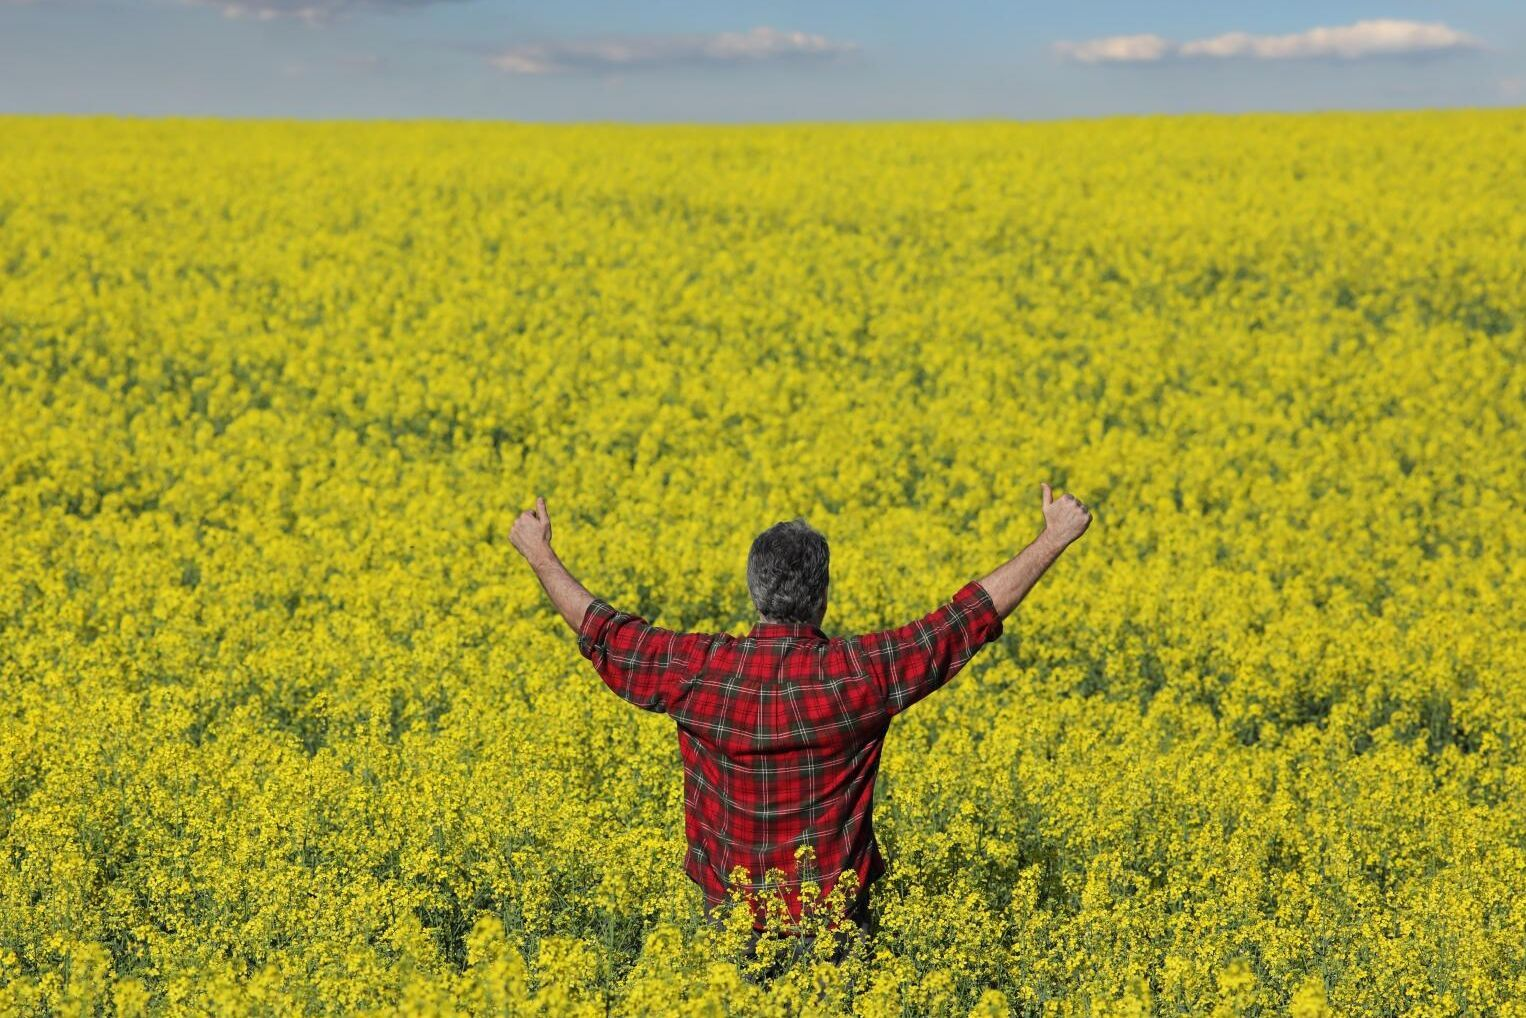 Andelen lantbrukare med en positiv syn på sin roll växer visar Landshypoteks senaste lantbrukarpanel.